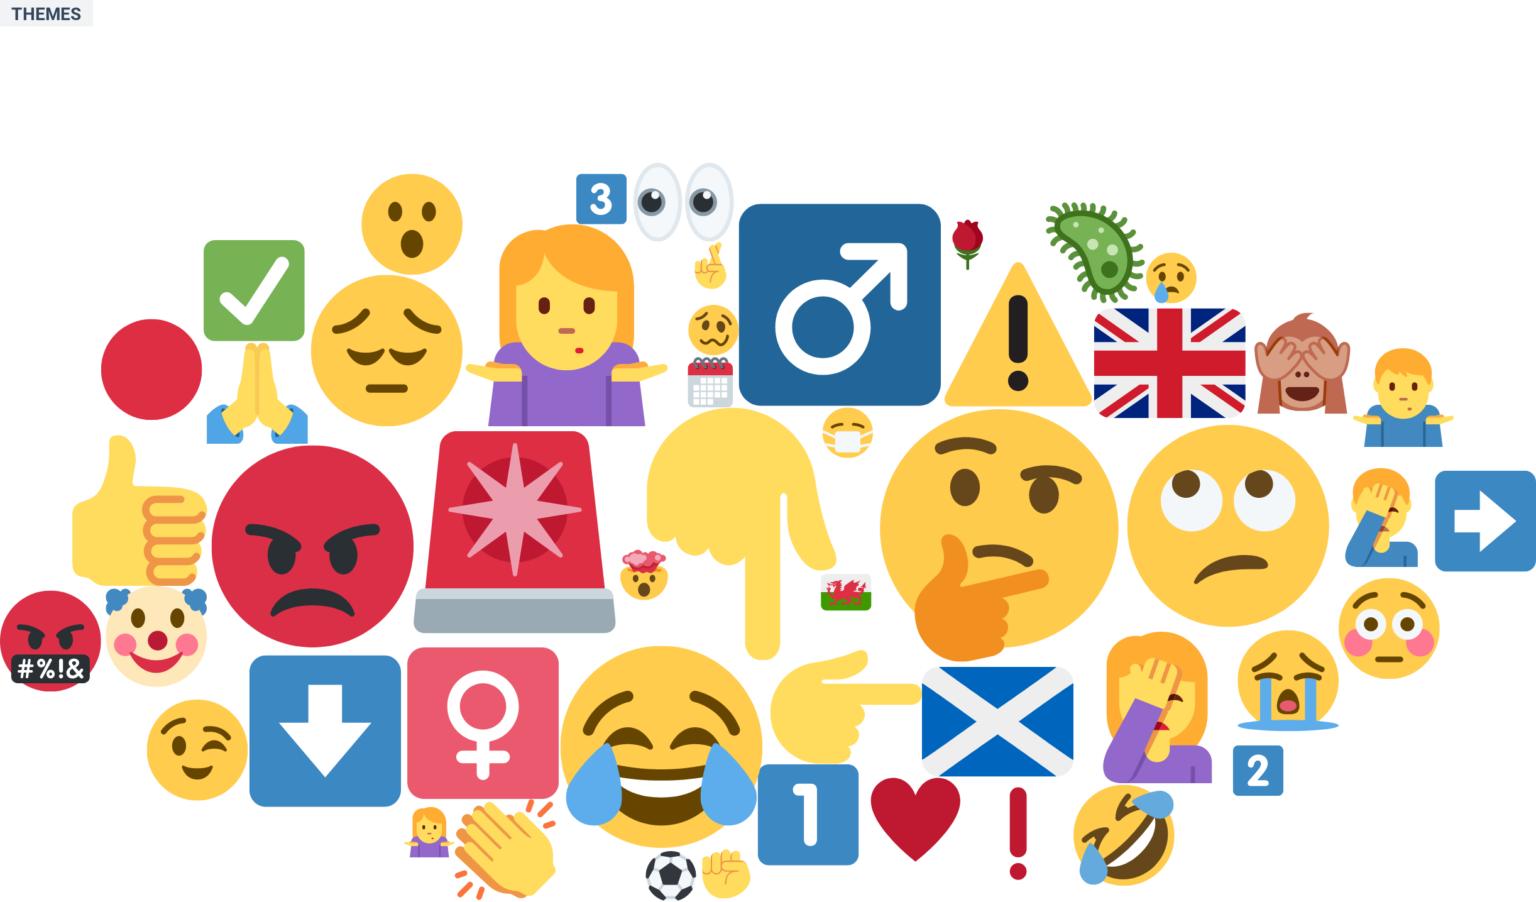 Emojis top themes